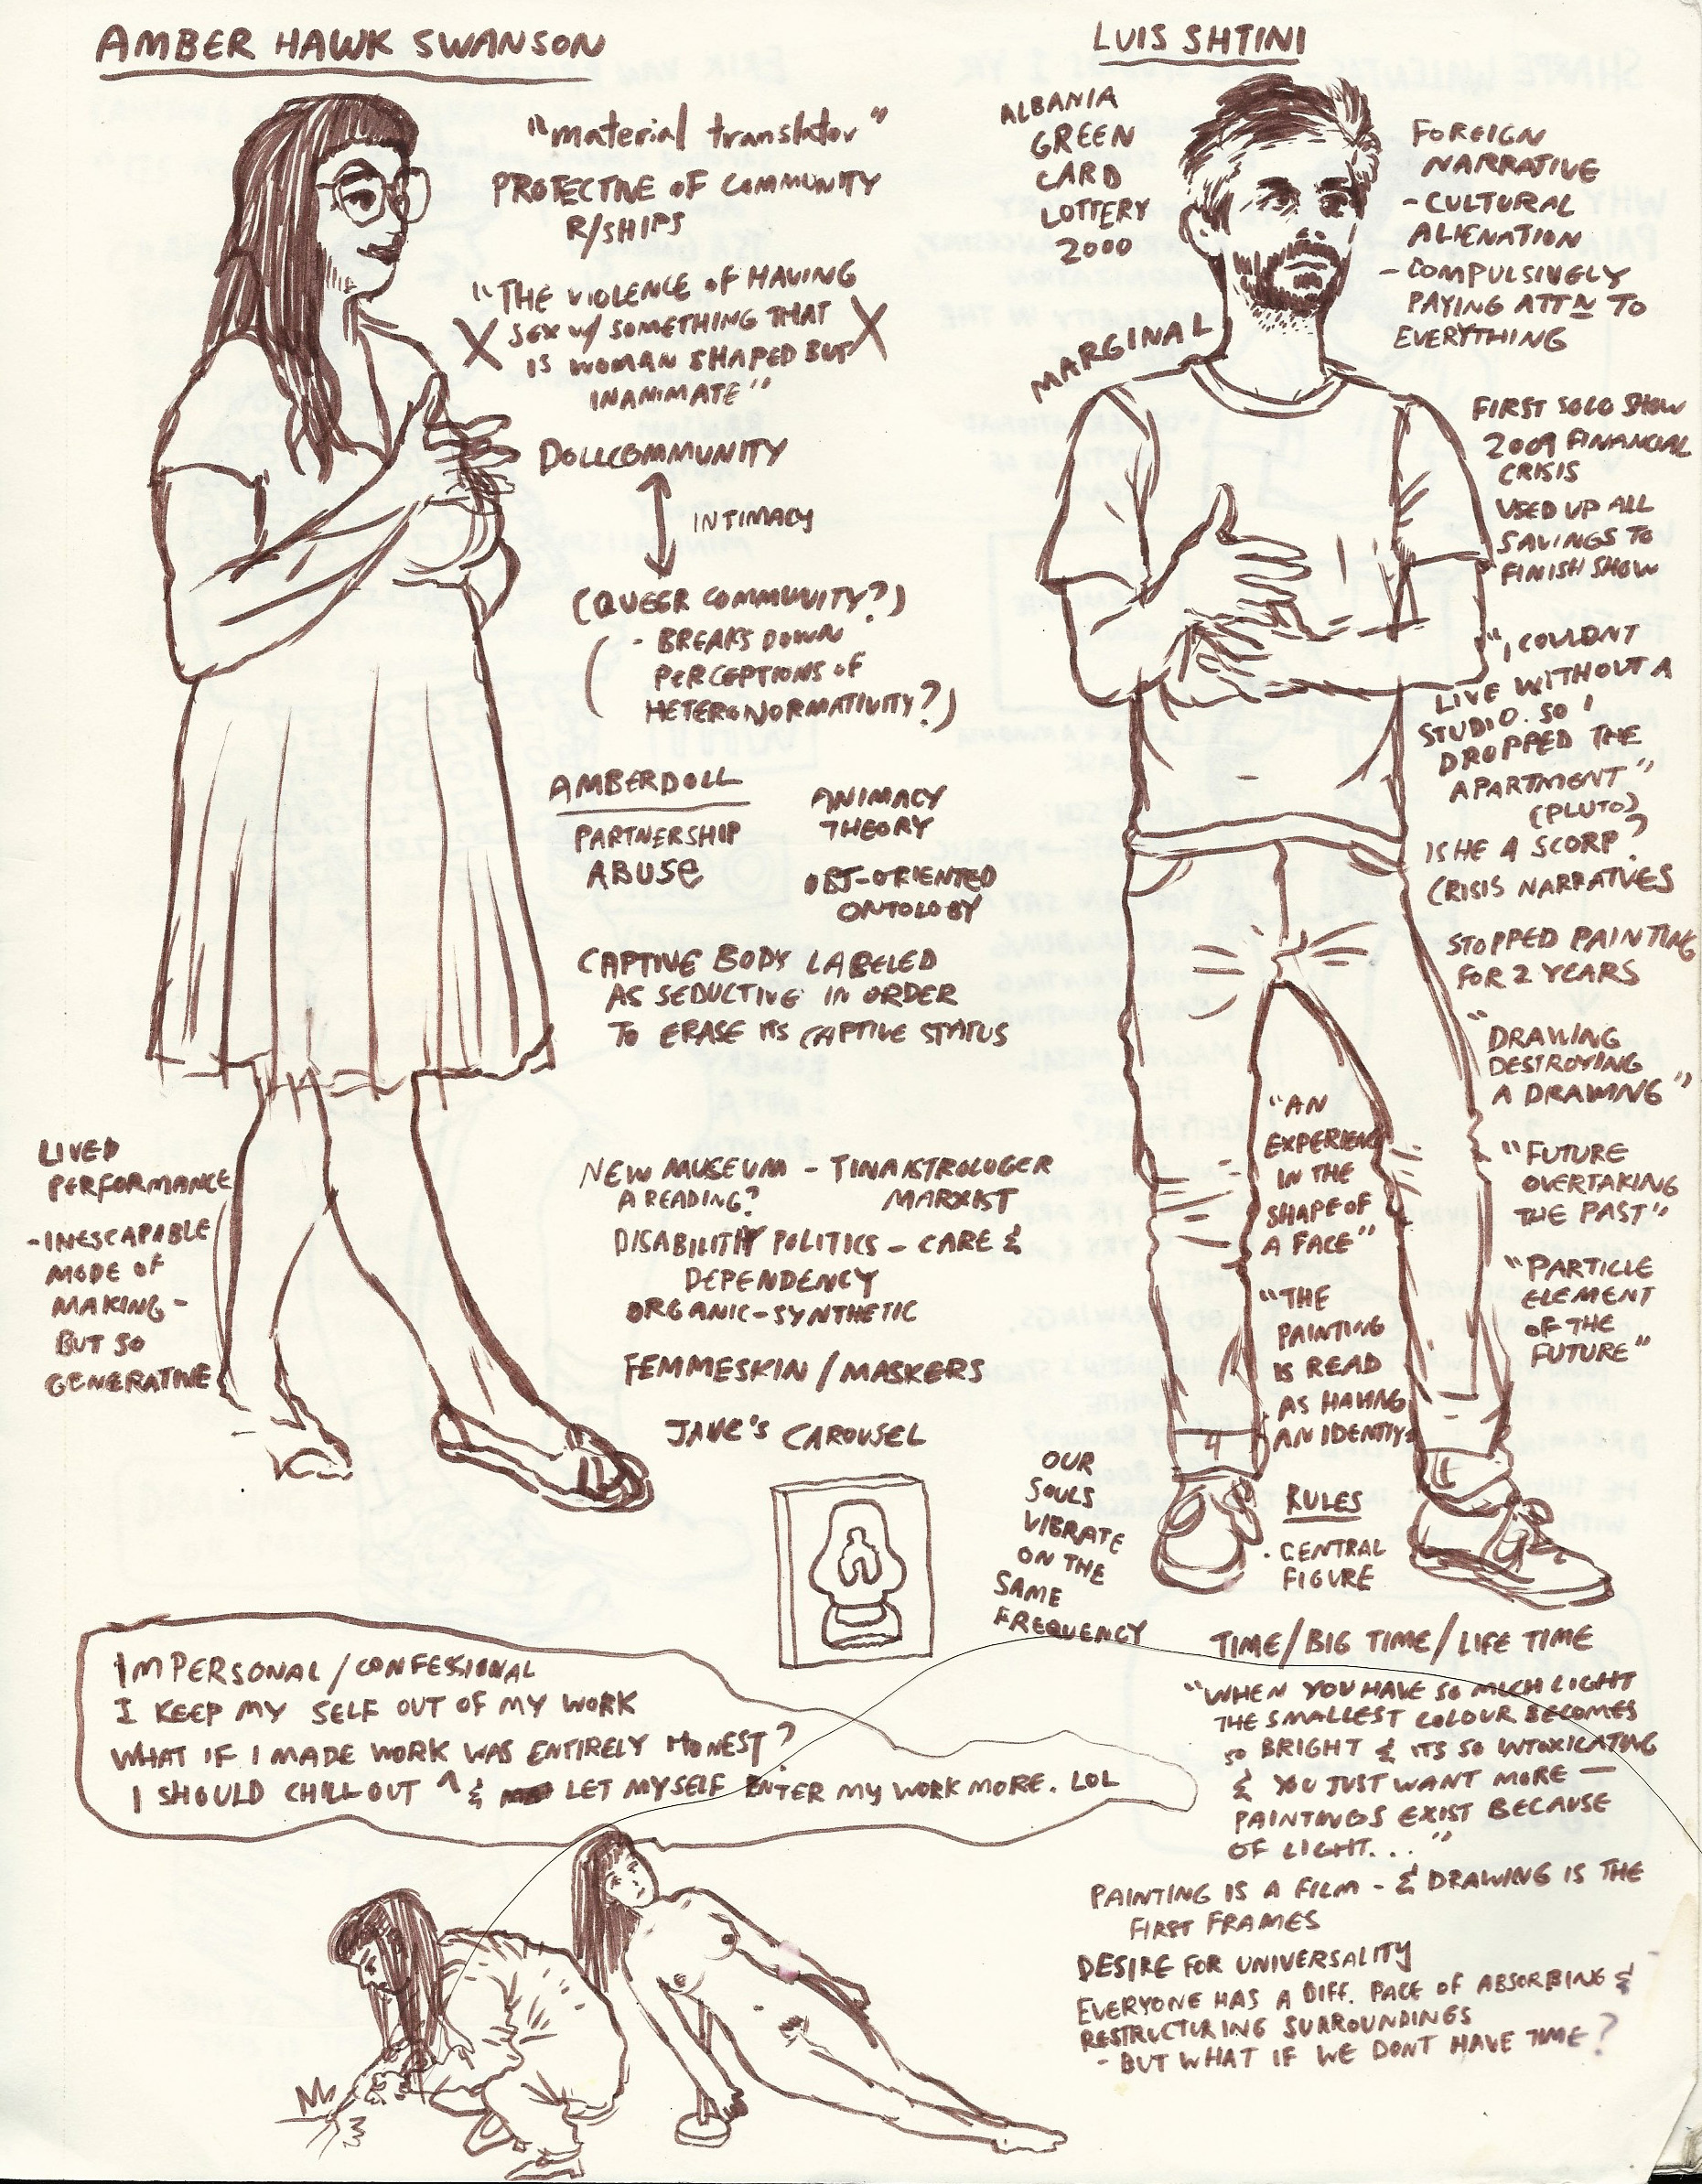 studio visits: Amber Hawk Swanson / Luis Shtini